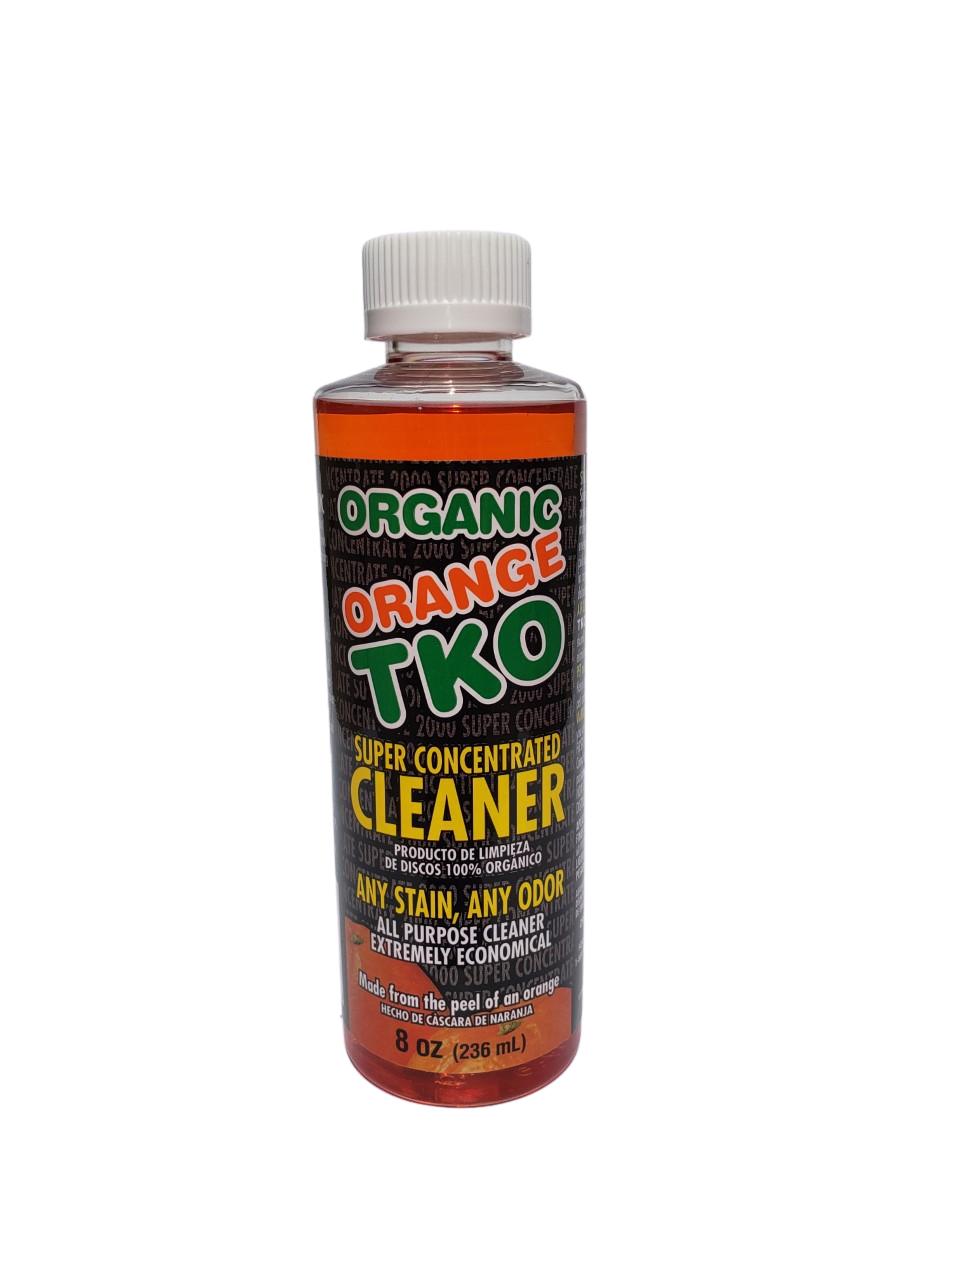 Orange TKO Super Concentrated Multi Cleaner Deodorizer Degreaser Disinfectant